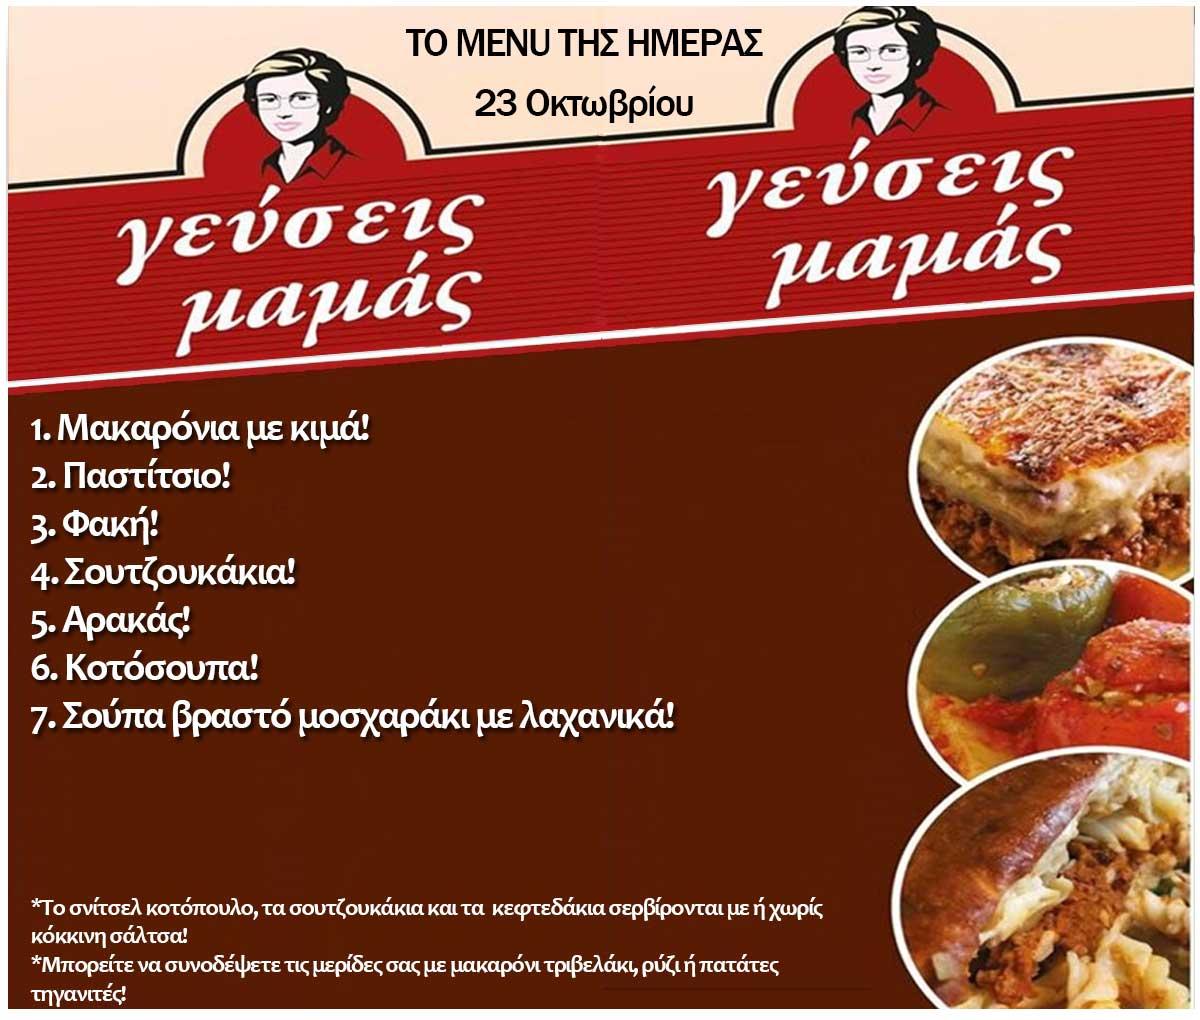 la_baguette_menu_imeras_kavala_citypedia_002